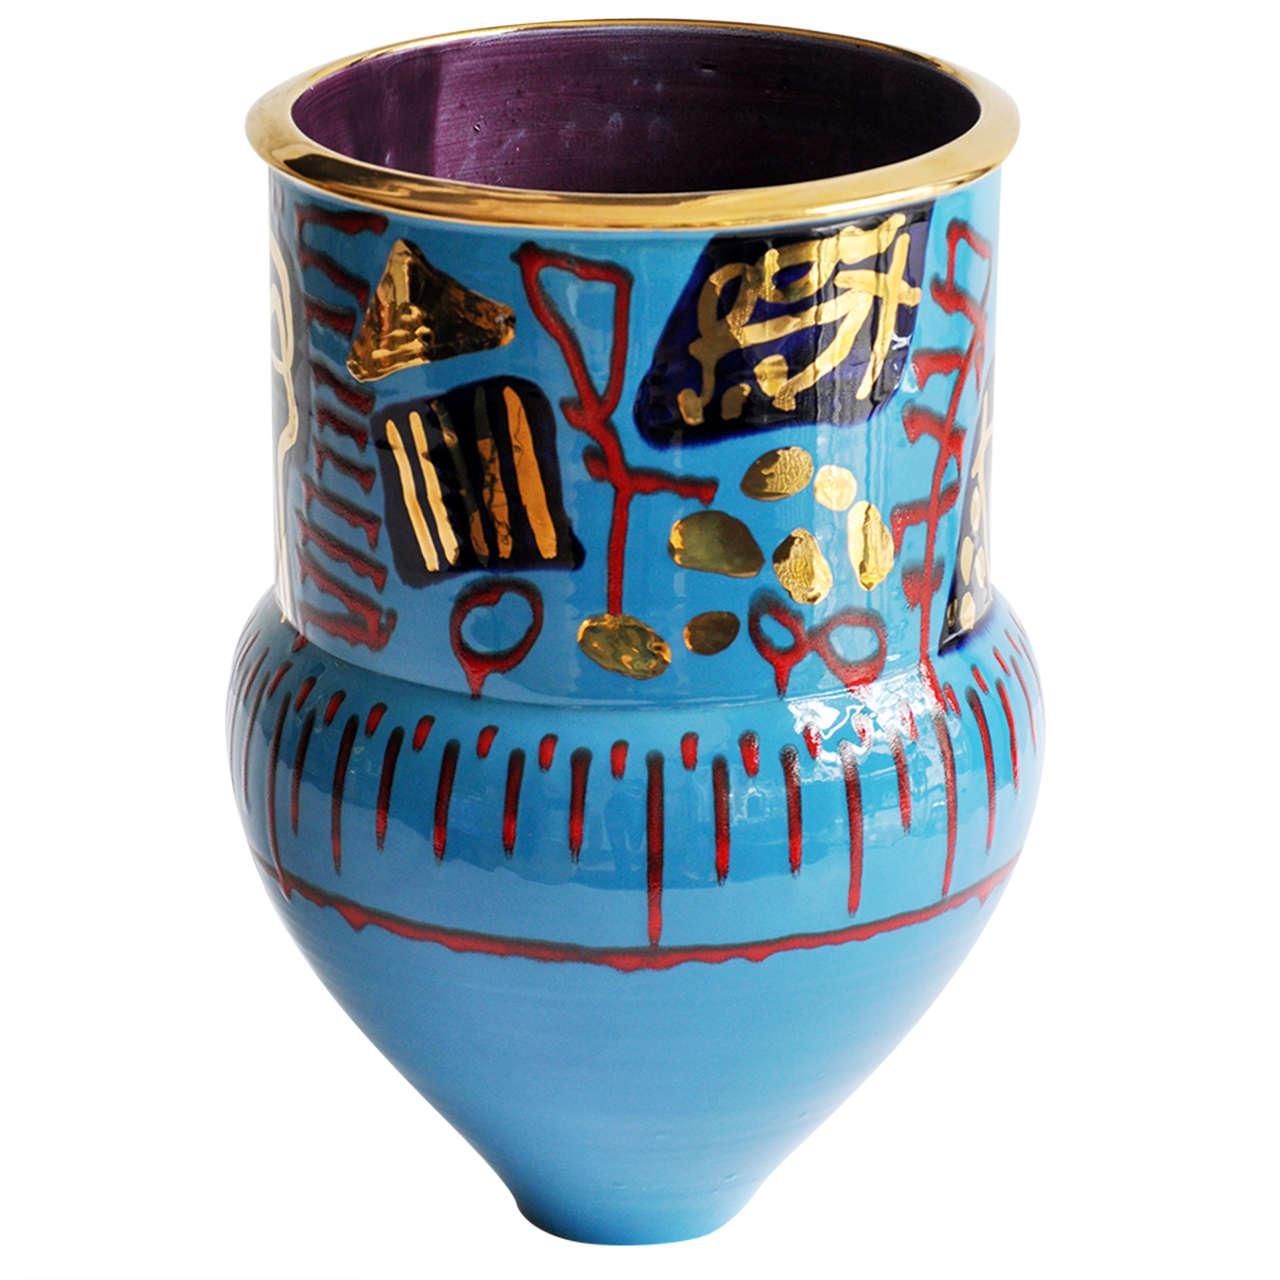 1980s Monumental Ceramic Vessel by Anna Silver